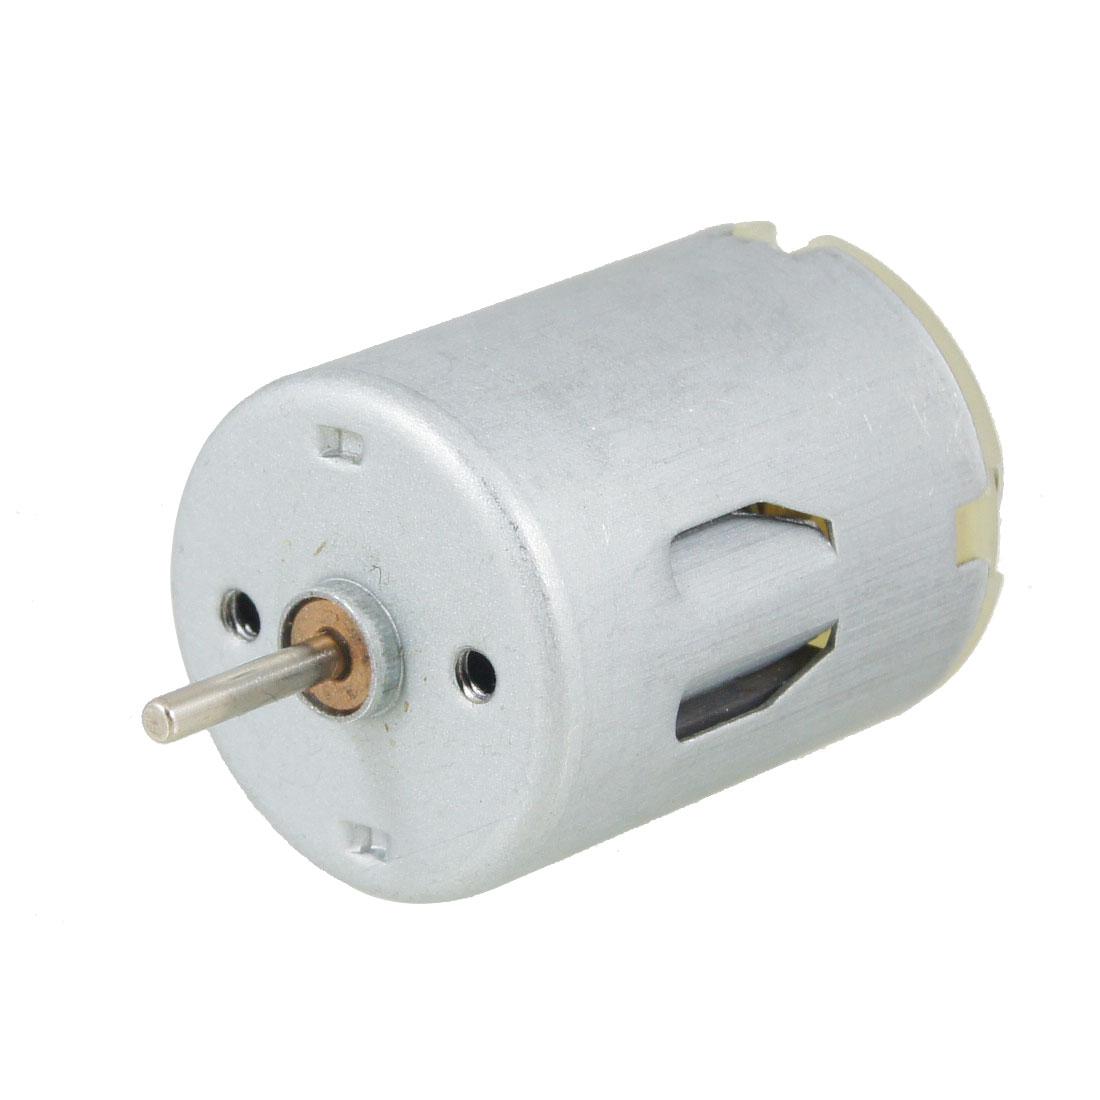 7800RPM DC 12V 2mm Shaft Diameter 2 Terminals Electric Micro Motor